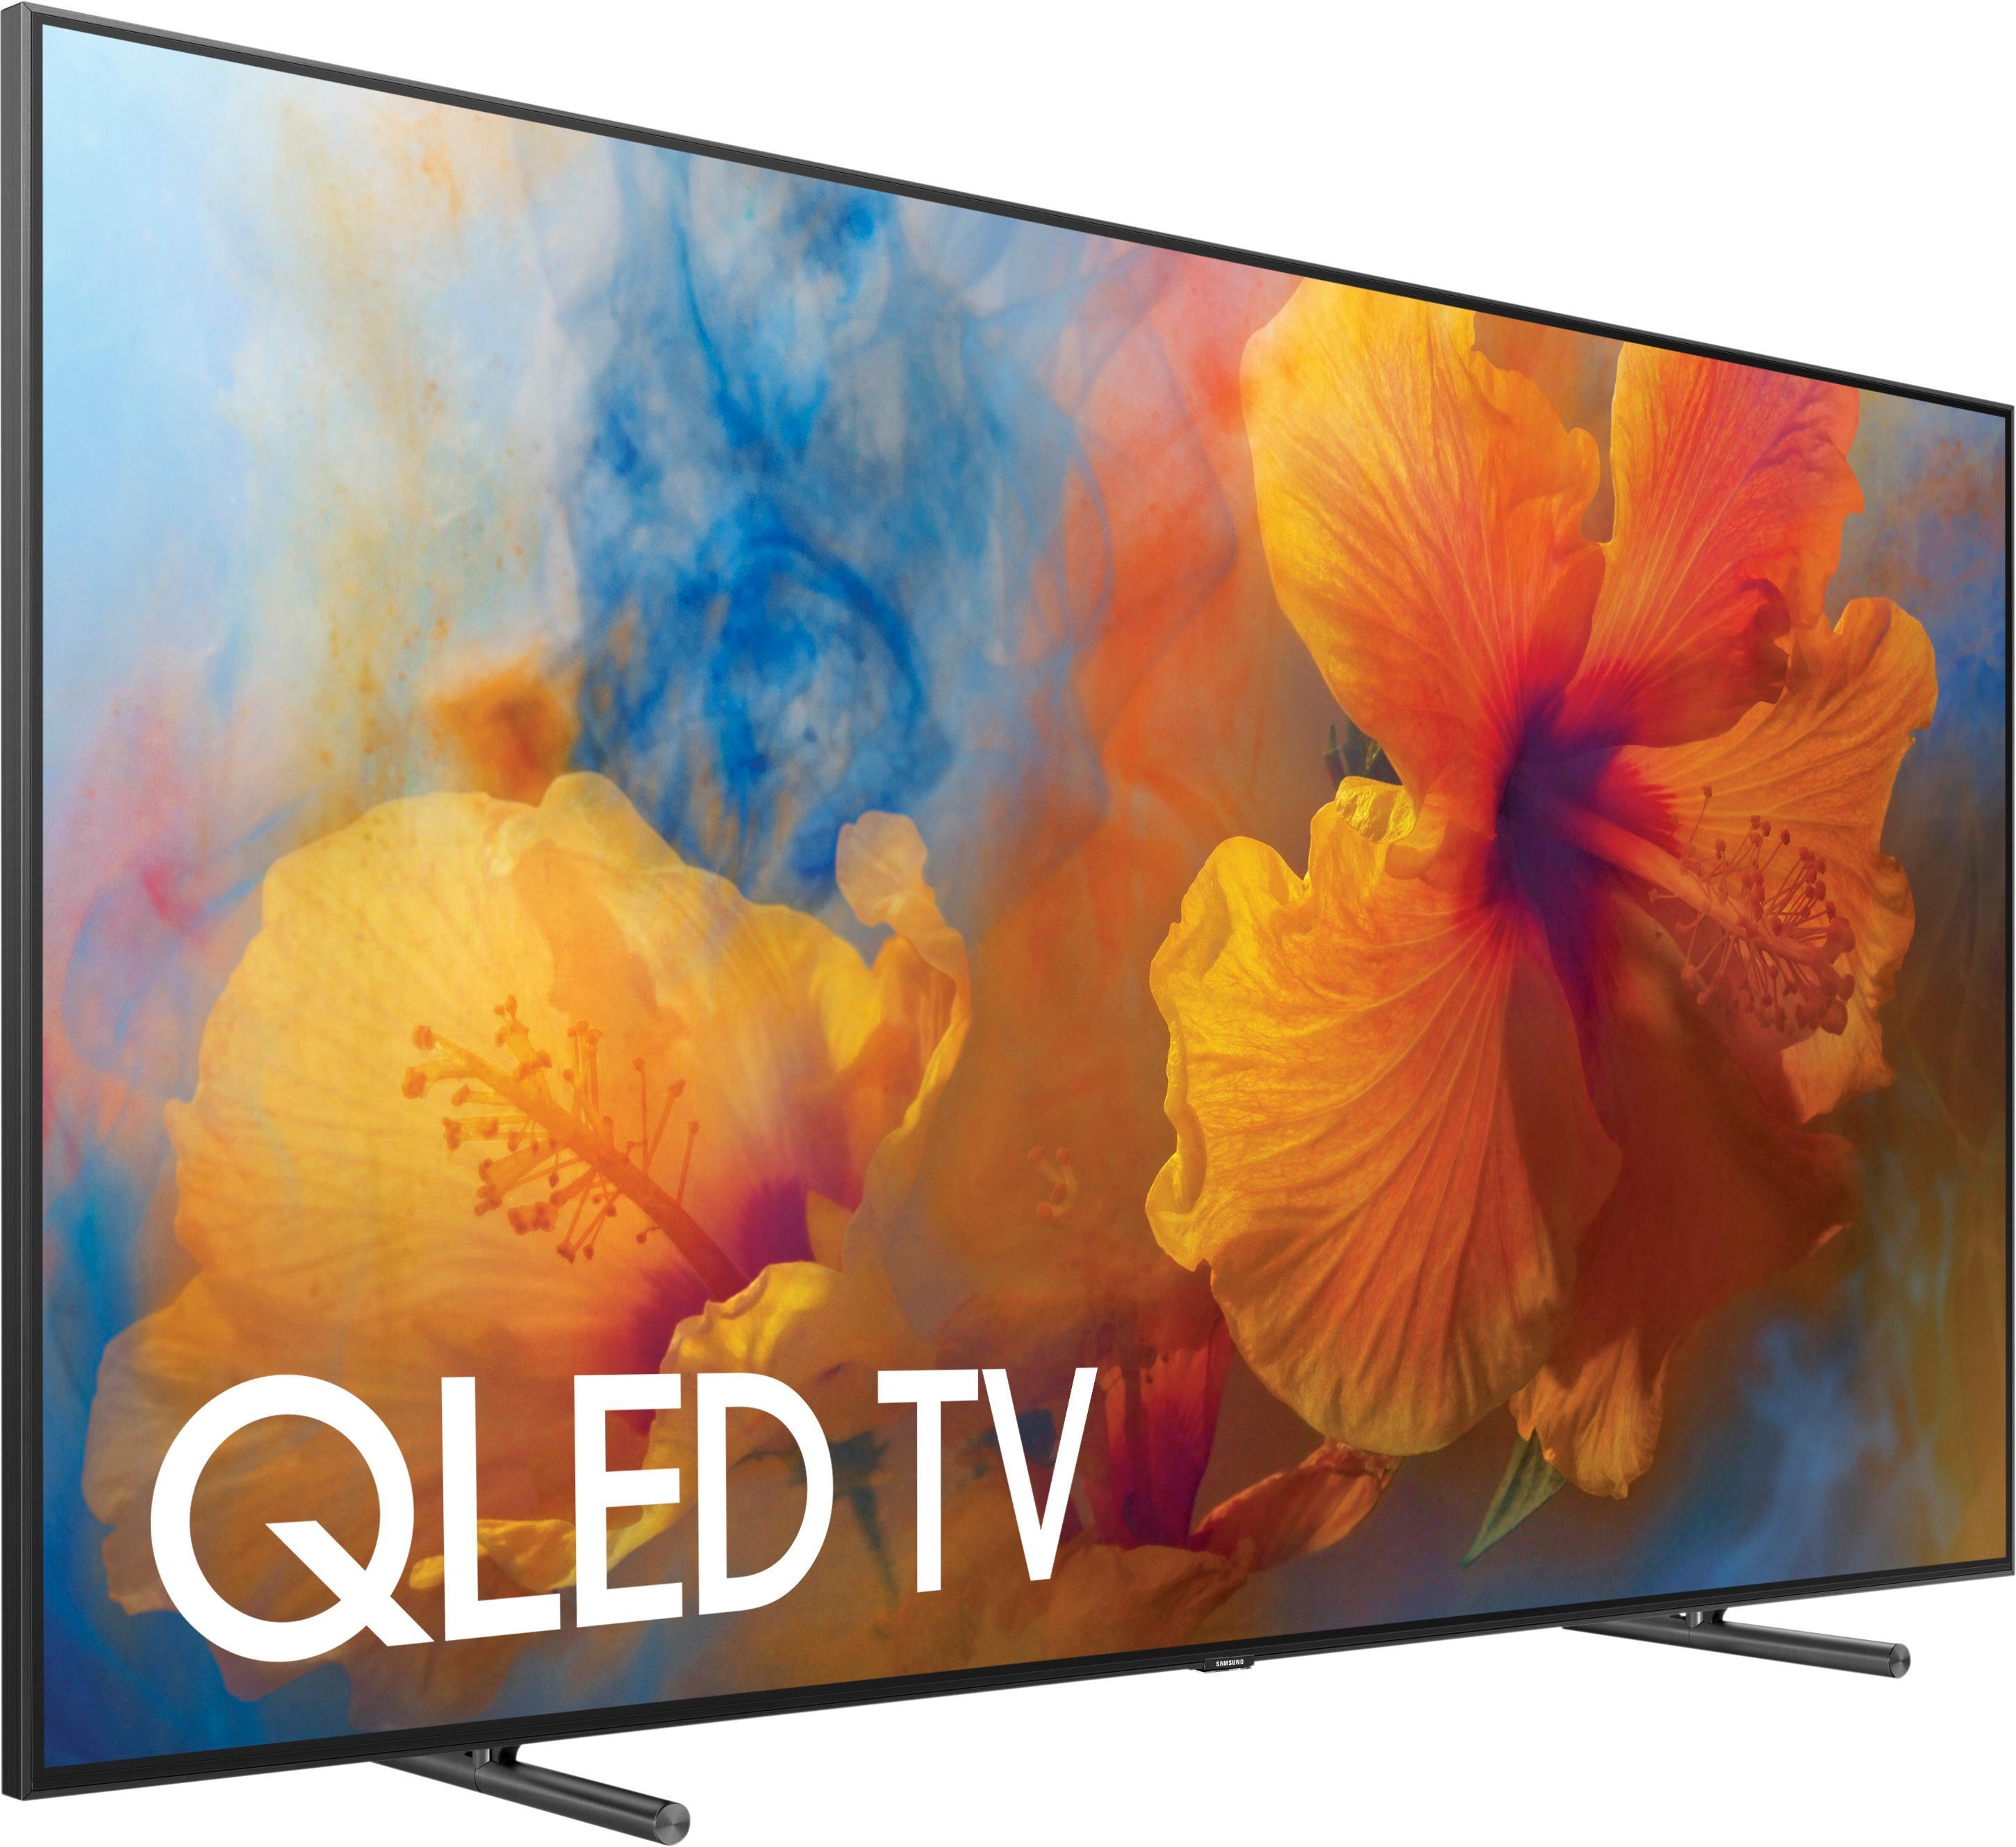 "Samsung QN88Q9FAMFXZA 88"" Class (88"" Diag.) LED 2160p Smart 4K Ultra HD TV with High Dynamic Range"